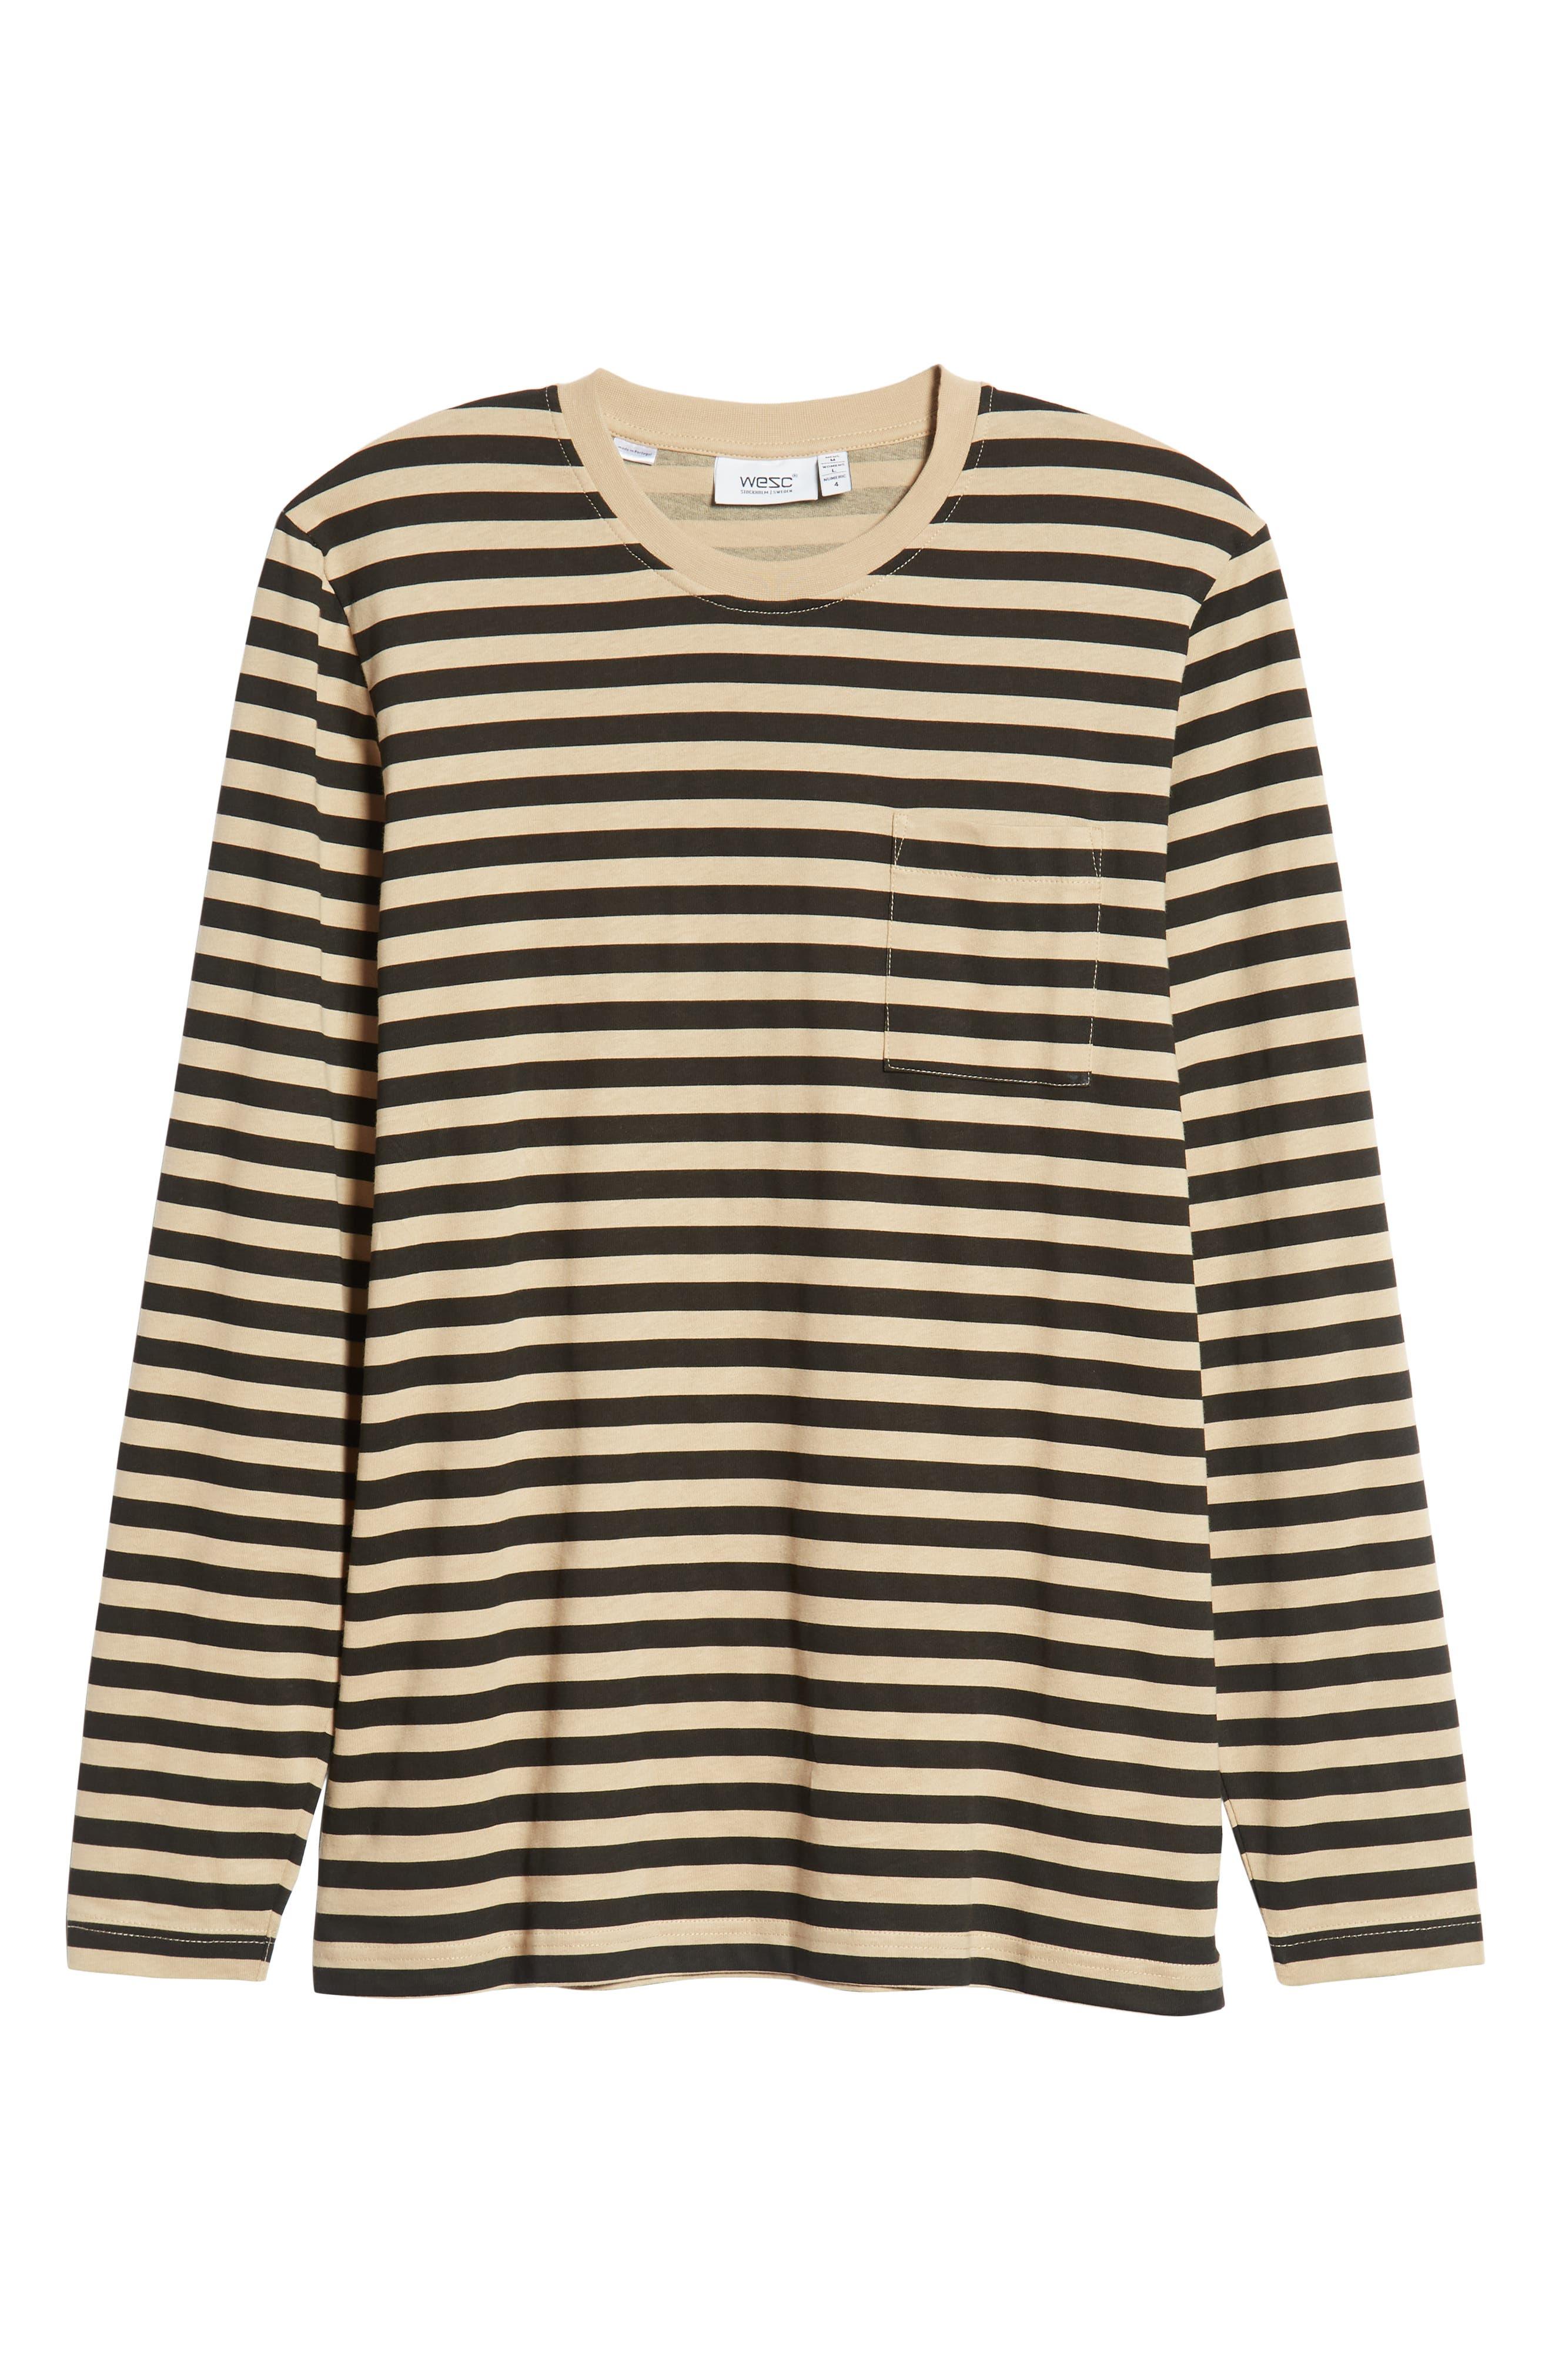 Makai Stripe Long Sleeve Pocket T-Shirt,                             Alternate thumbnail 6, color,                             271